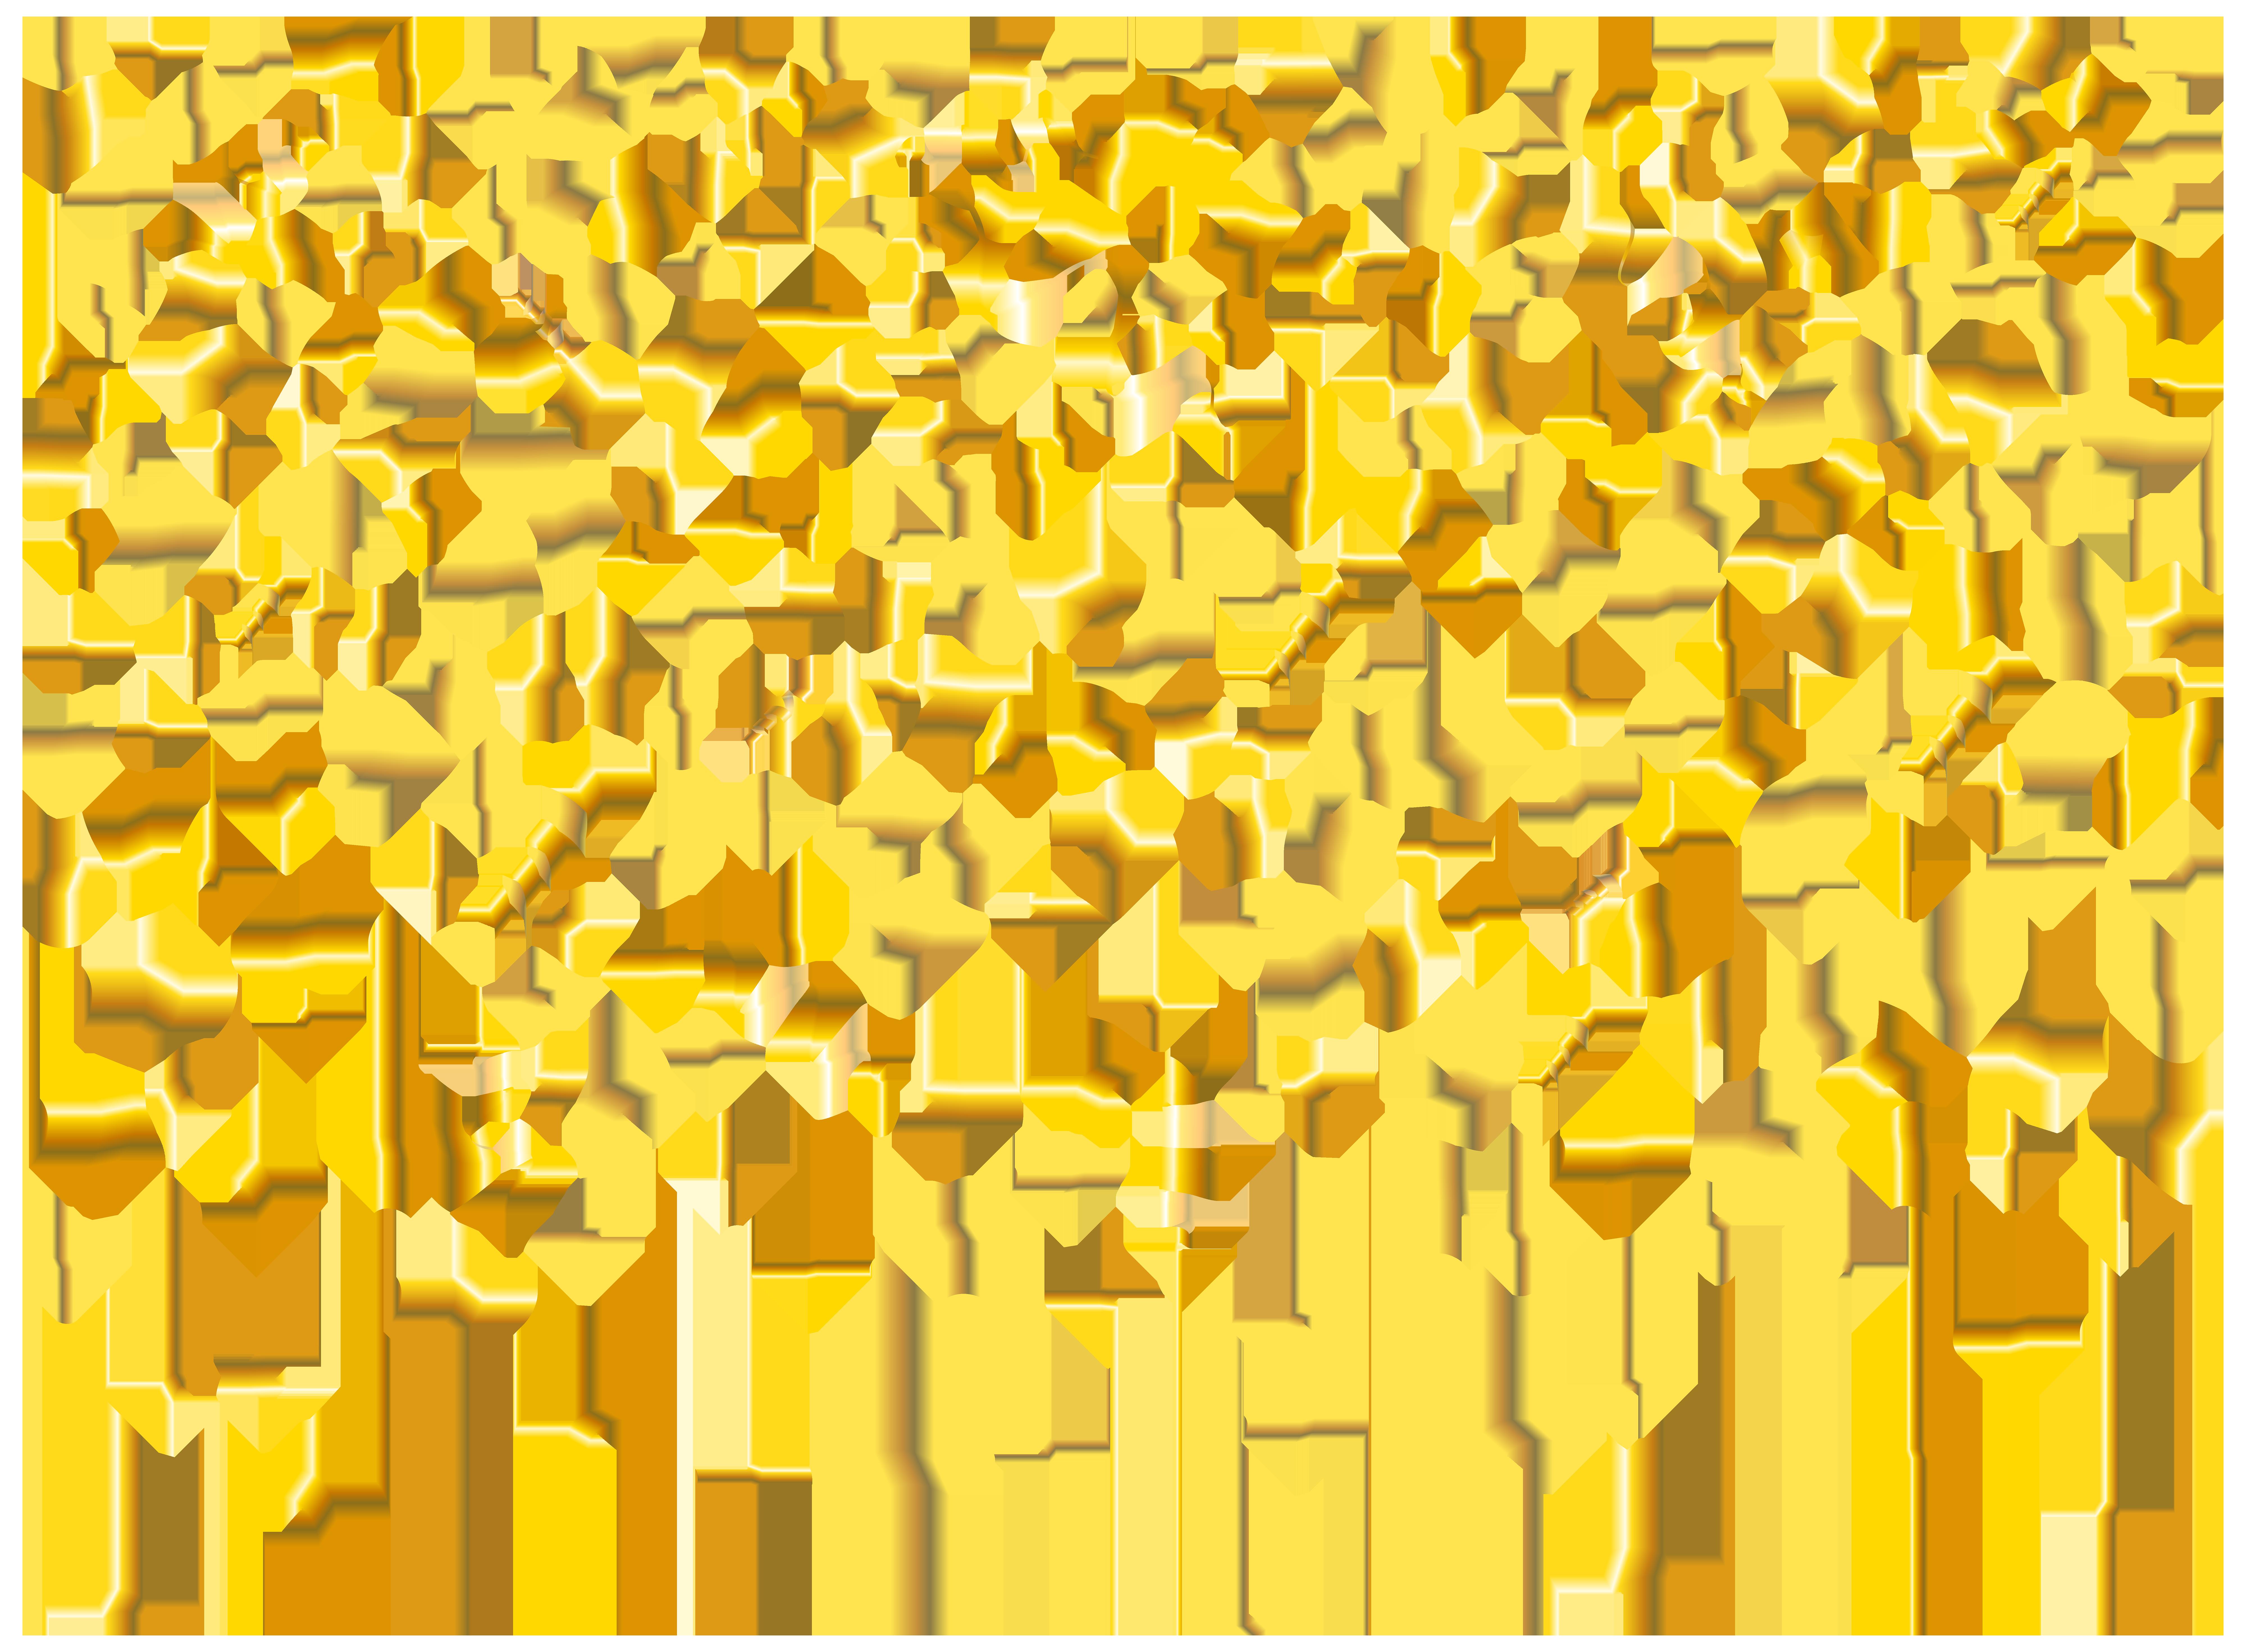 Star confetti clipart clip art royalty free download Confetti Transparent Clip Art PNG Image | Gallery Yopriceville ... clip art royalty free download